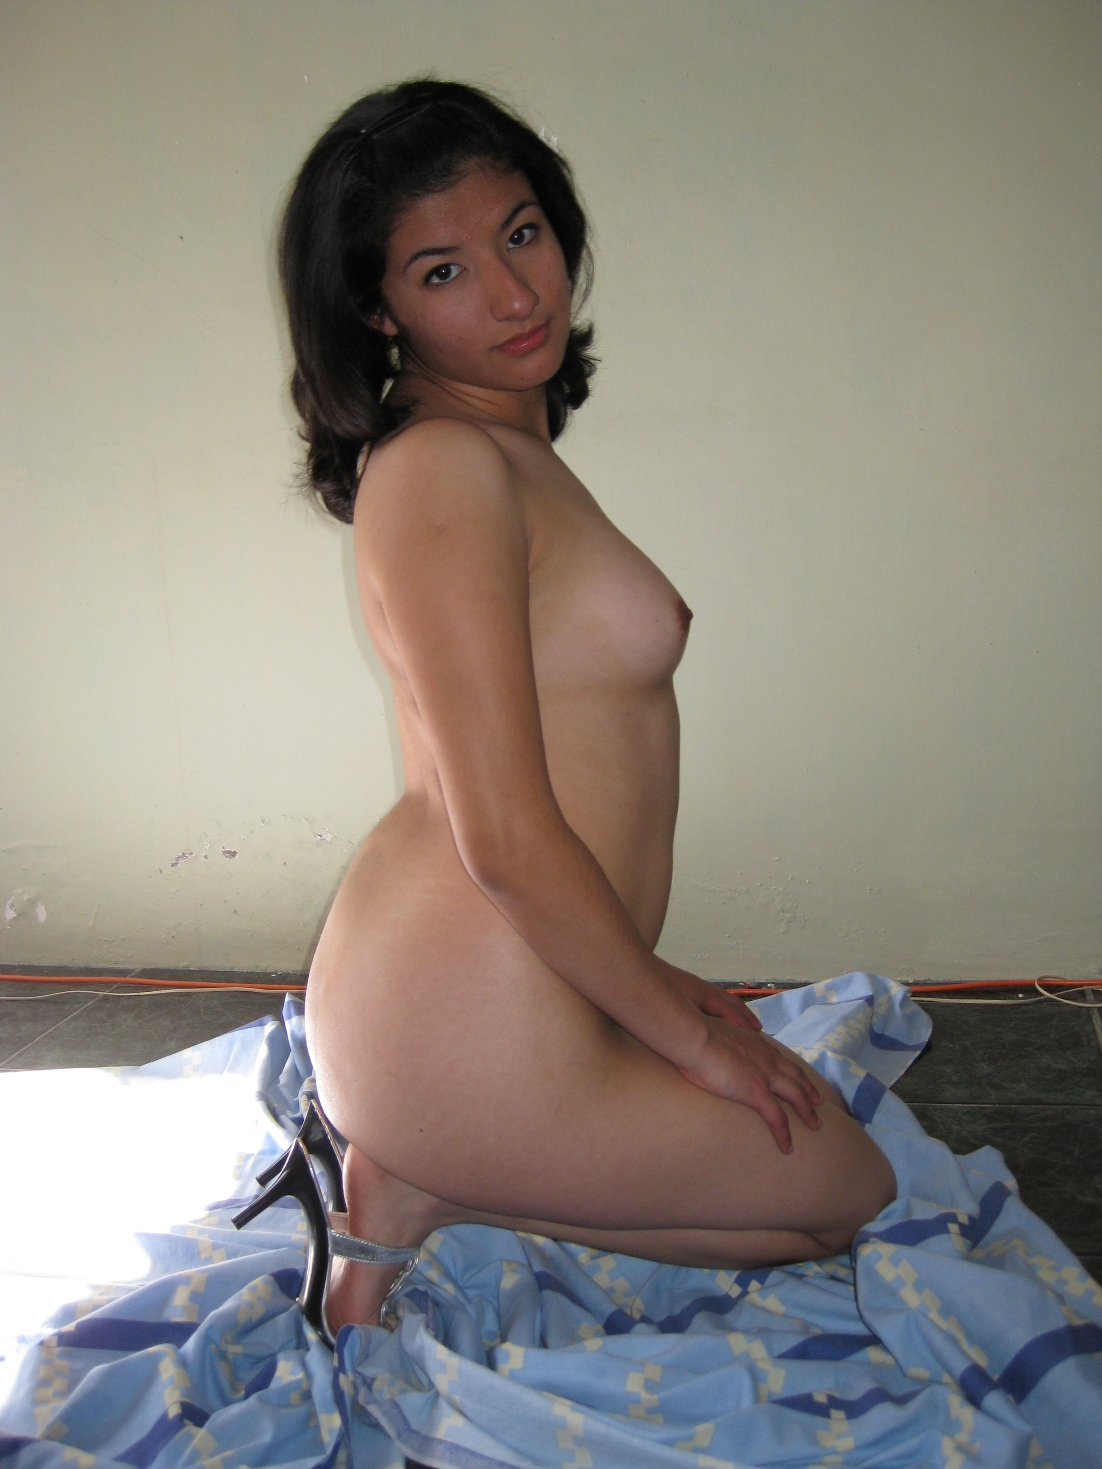 Interracial amateur deep sex